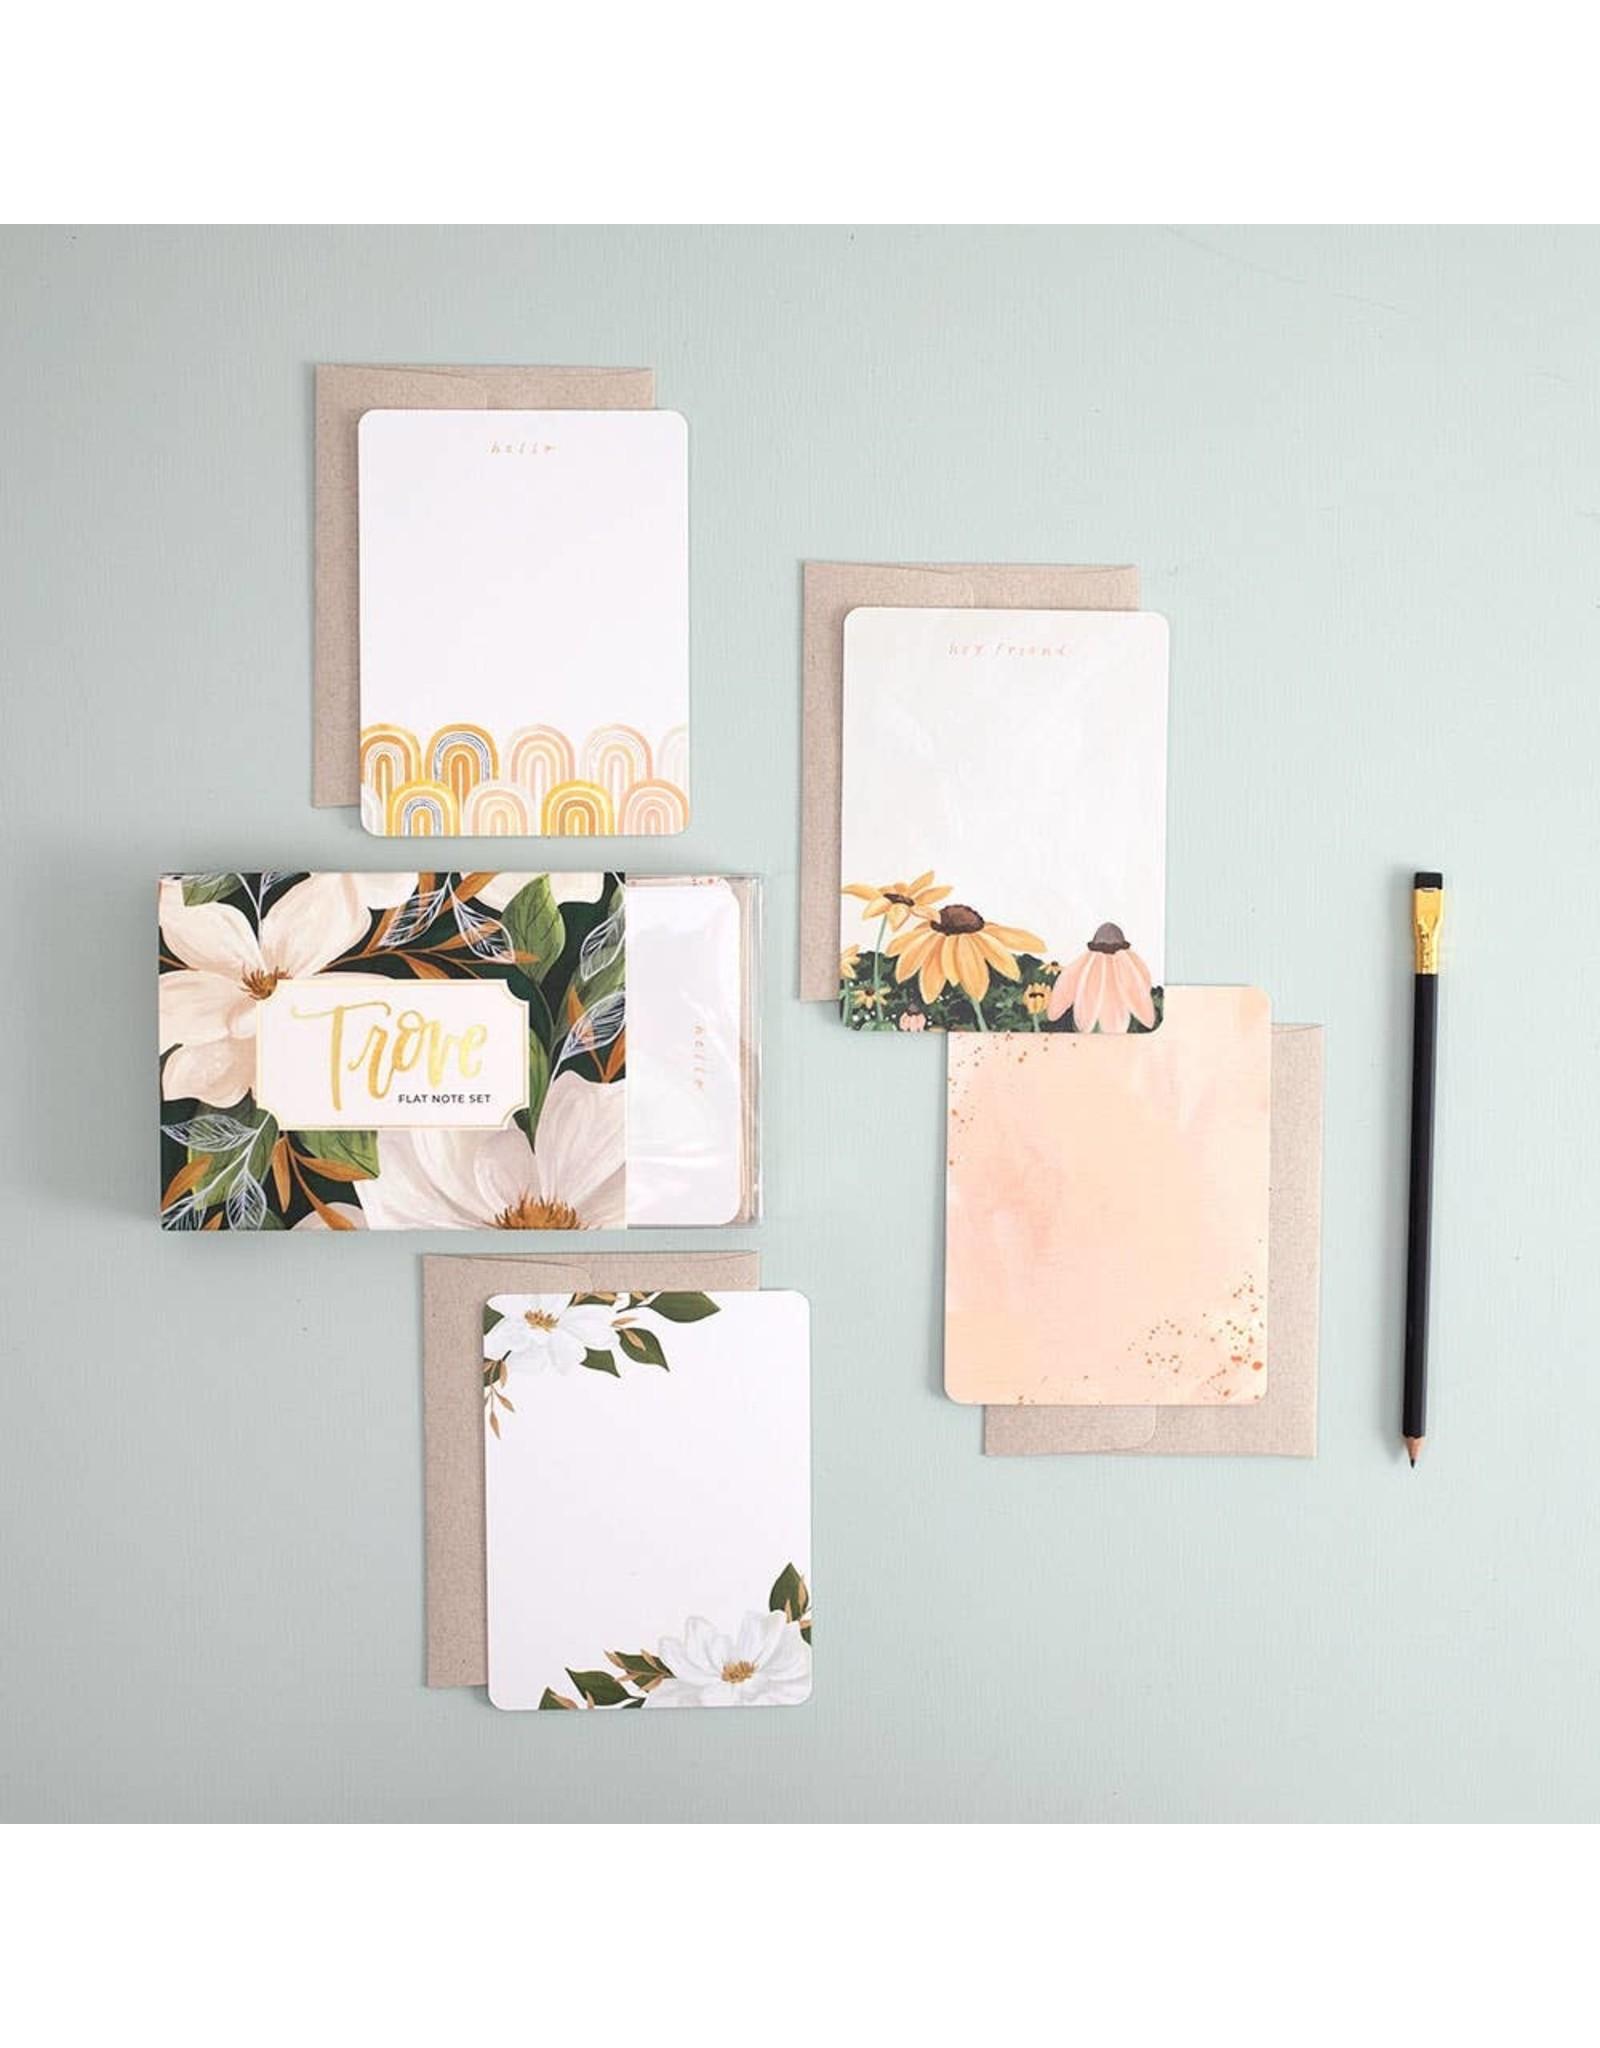 Trove Flat Note Set